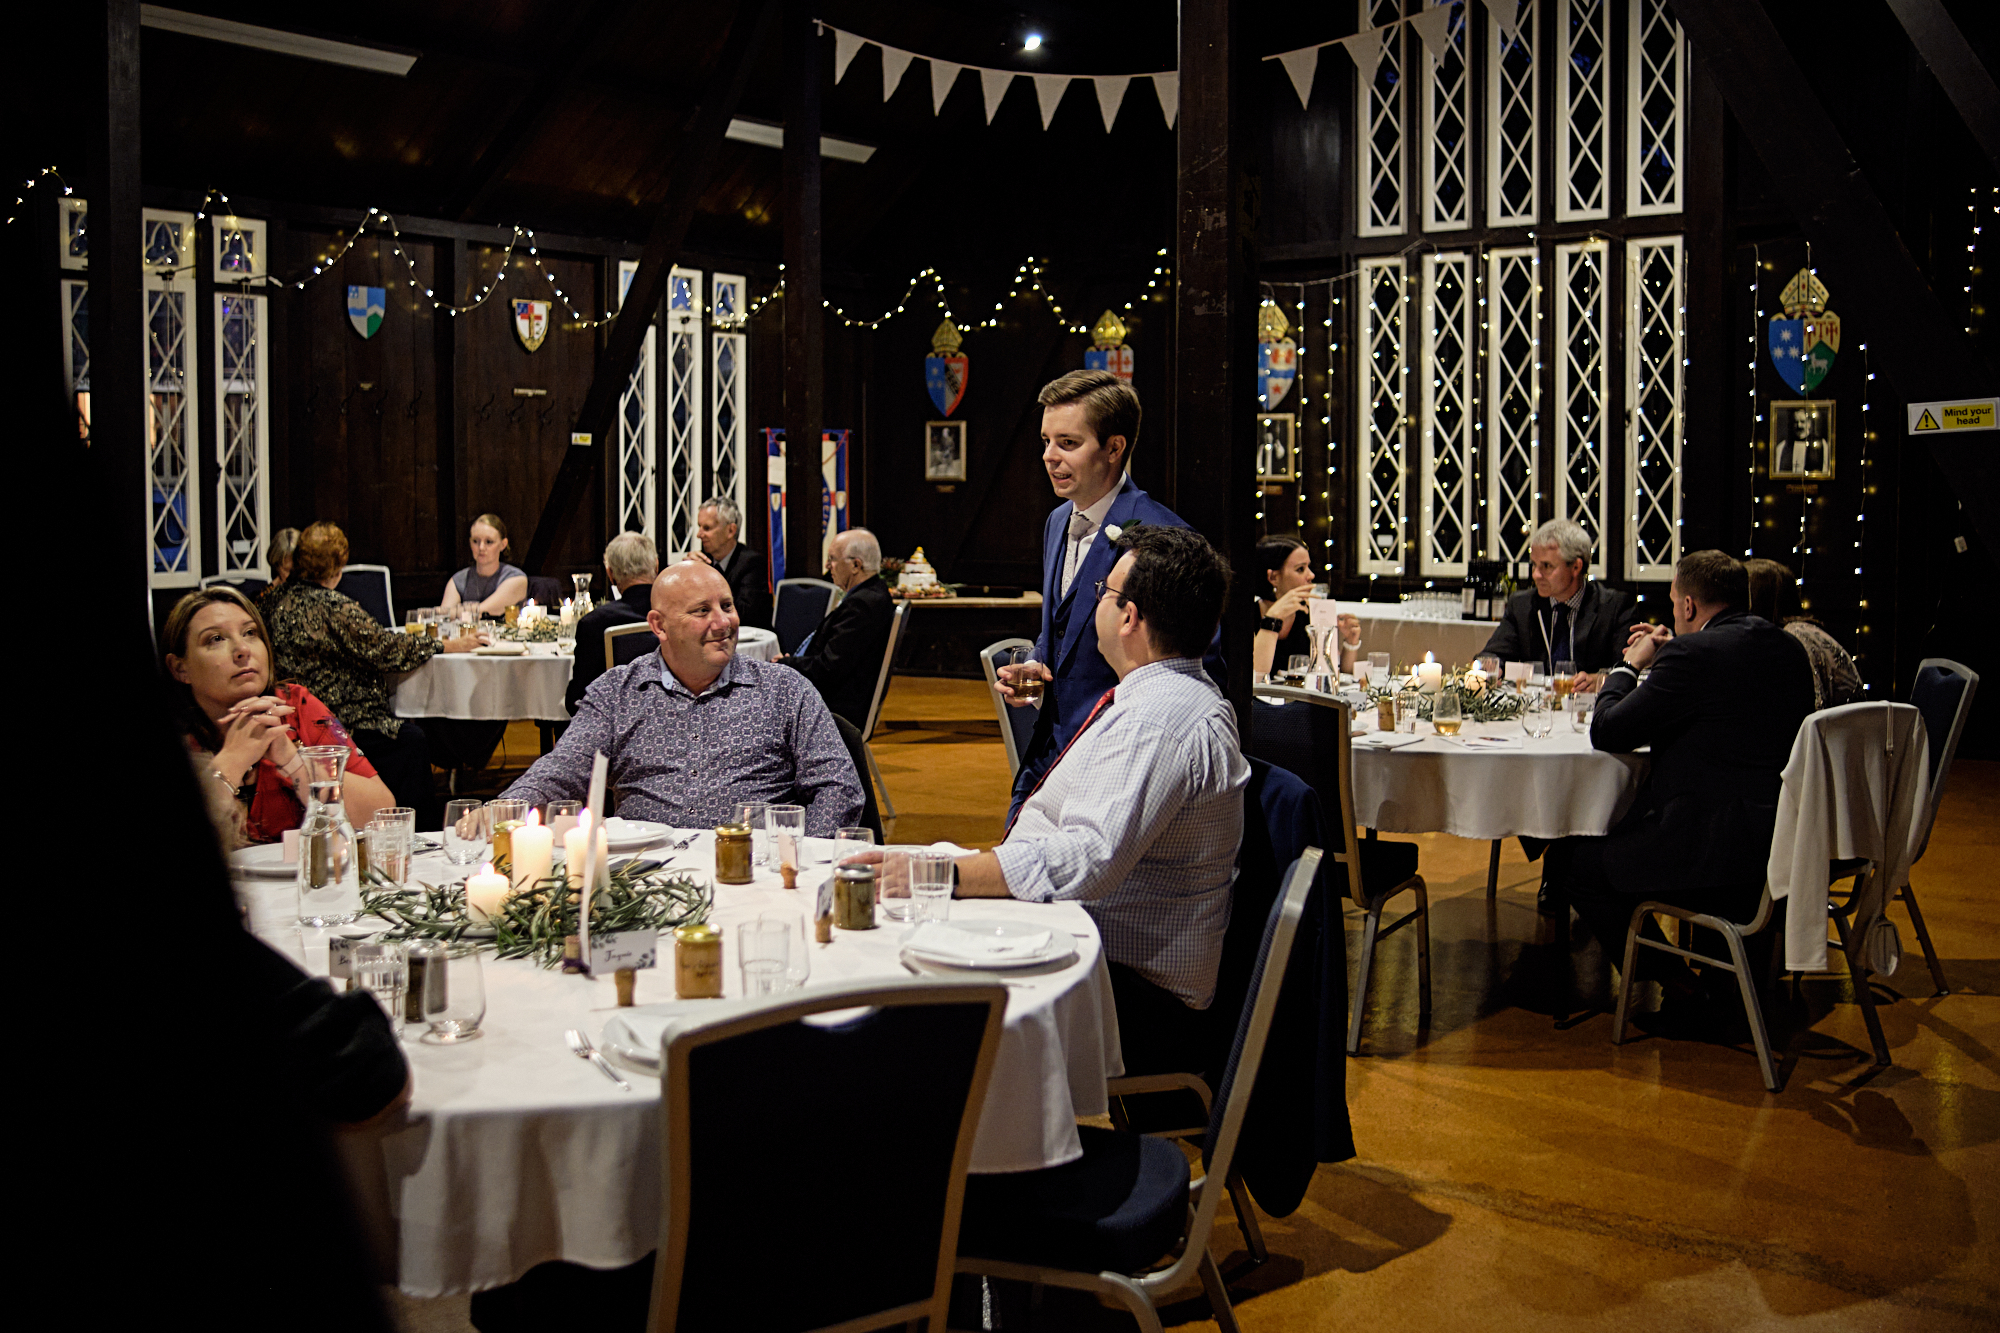 wedding photographers Auckland 87592